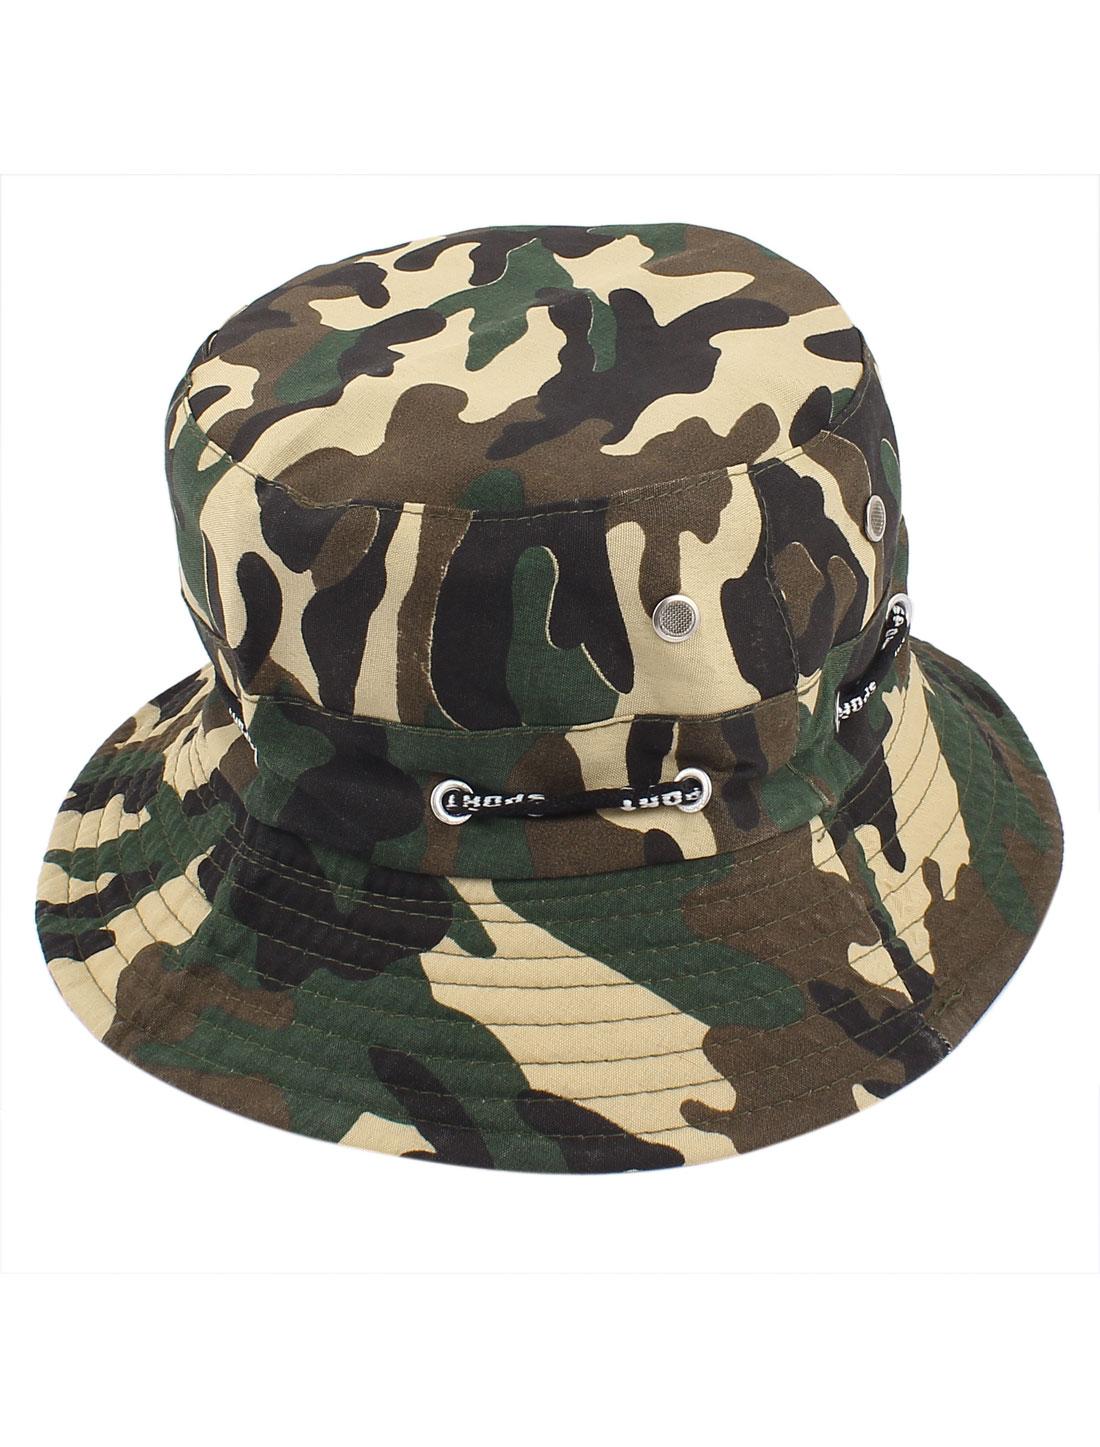 Men Women Unisex Camouflage Pattern Adjustable Strap Outdoor Fishing Bucket Cap Hat Army Green